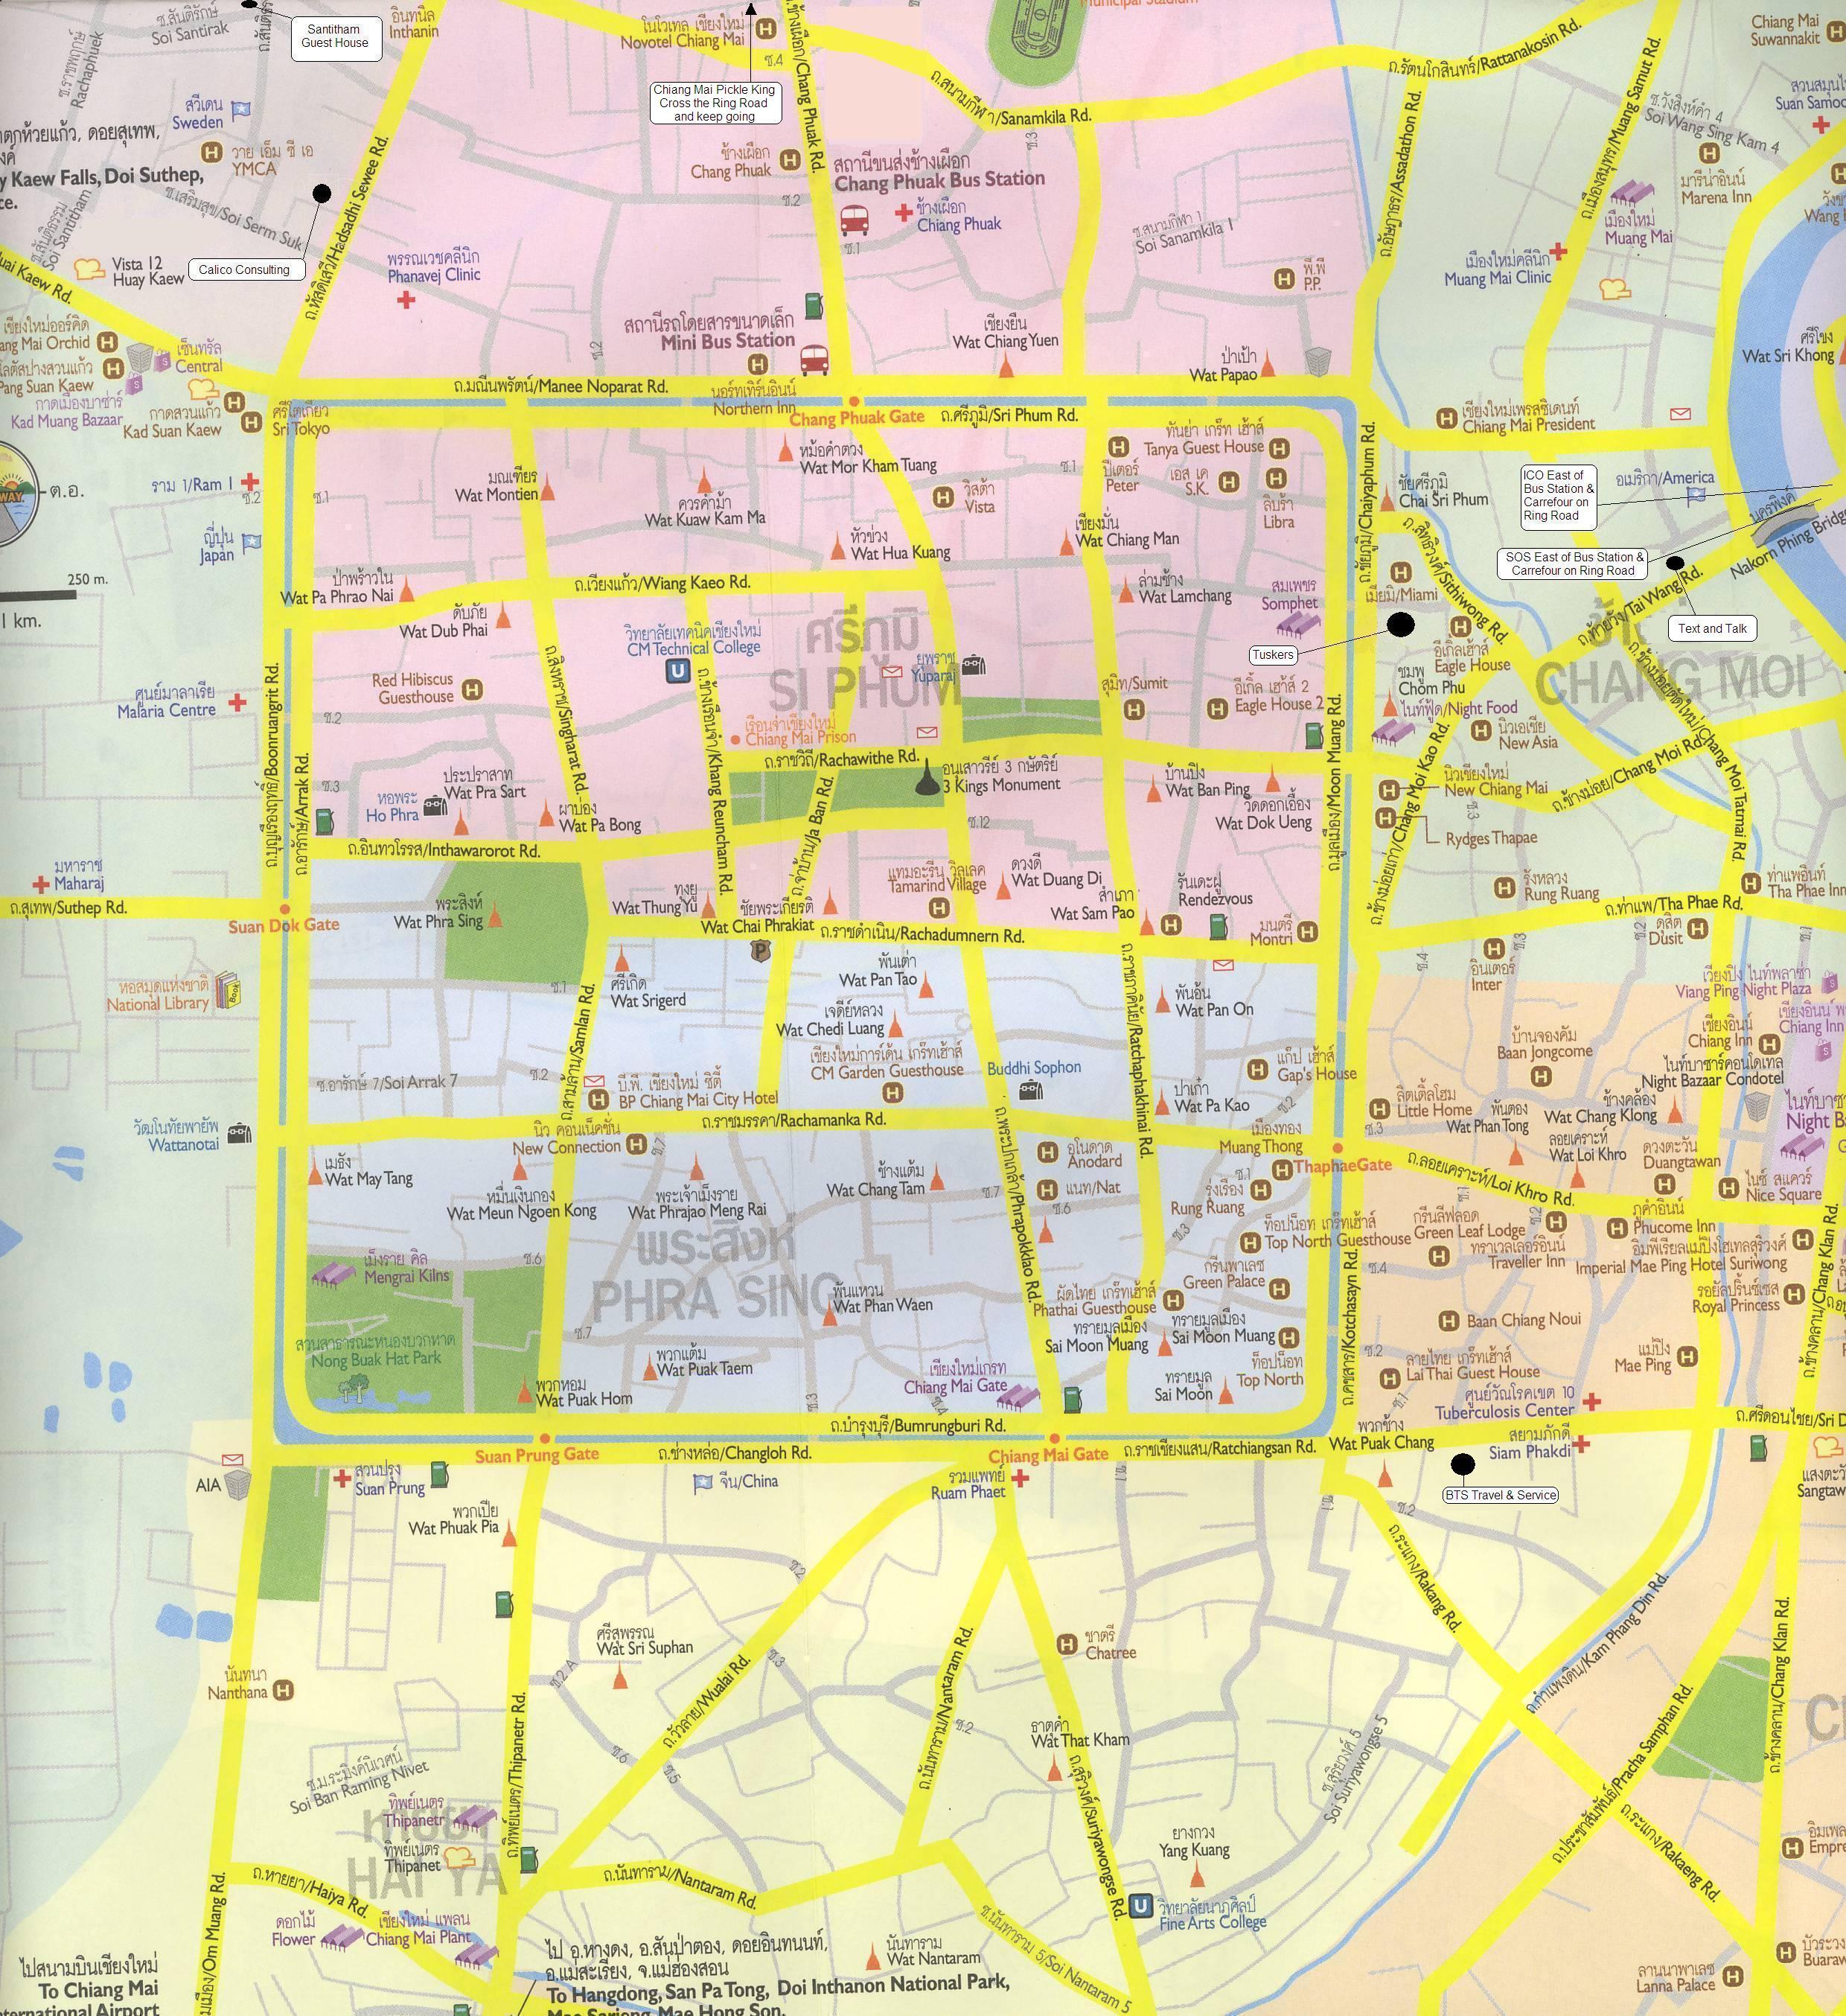 Chiang Mai Hotel Map Chiang Mai mappery